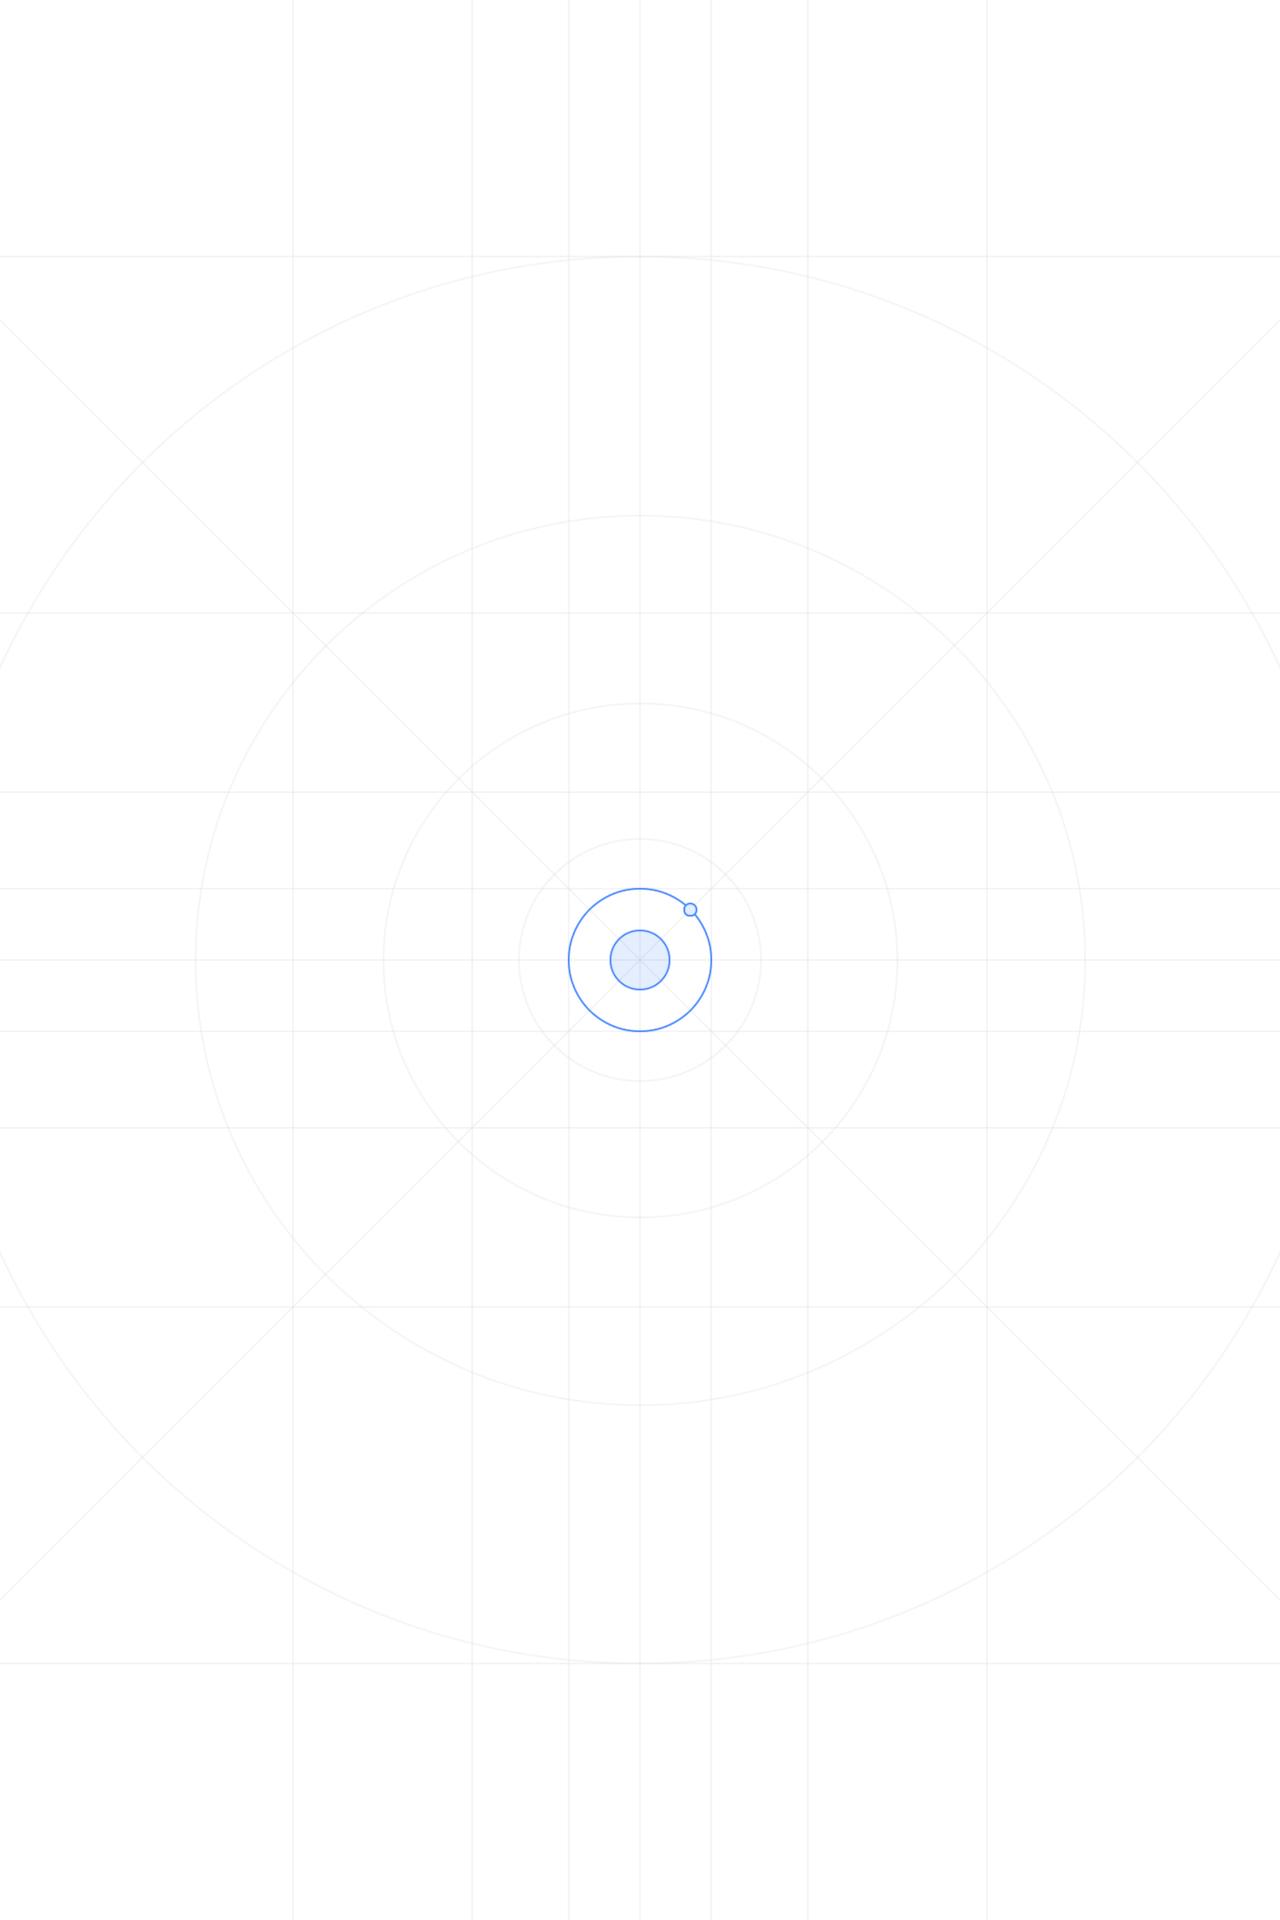 klu5/resources/android/splash/drawable-port-xxxhdpi-screen.png